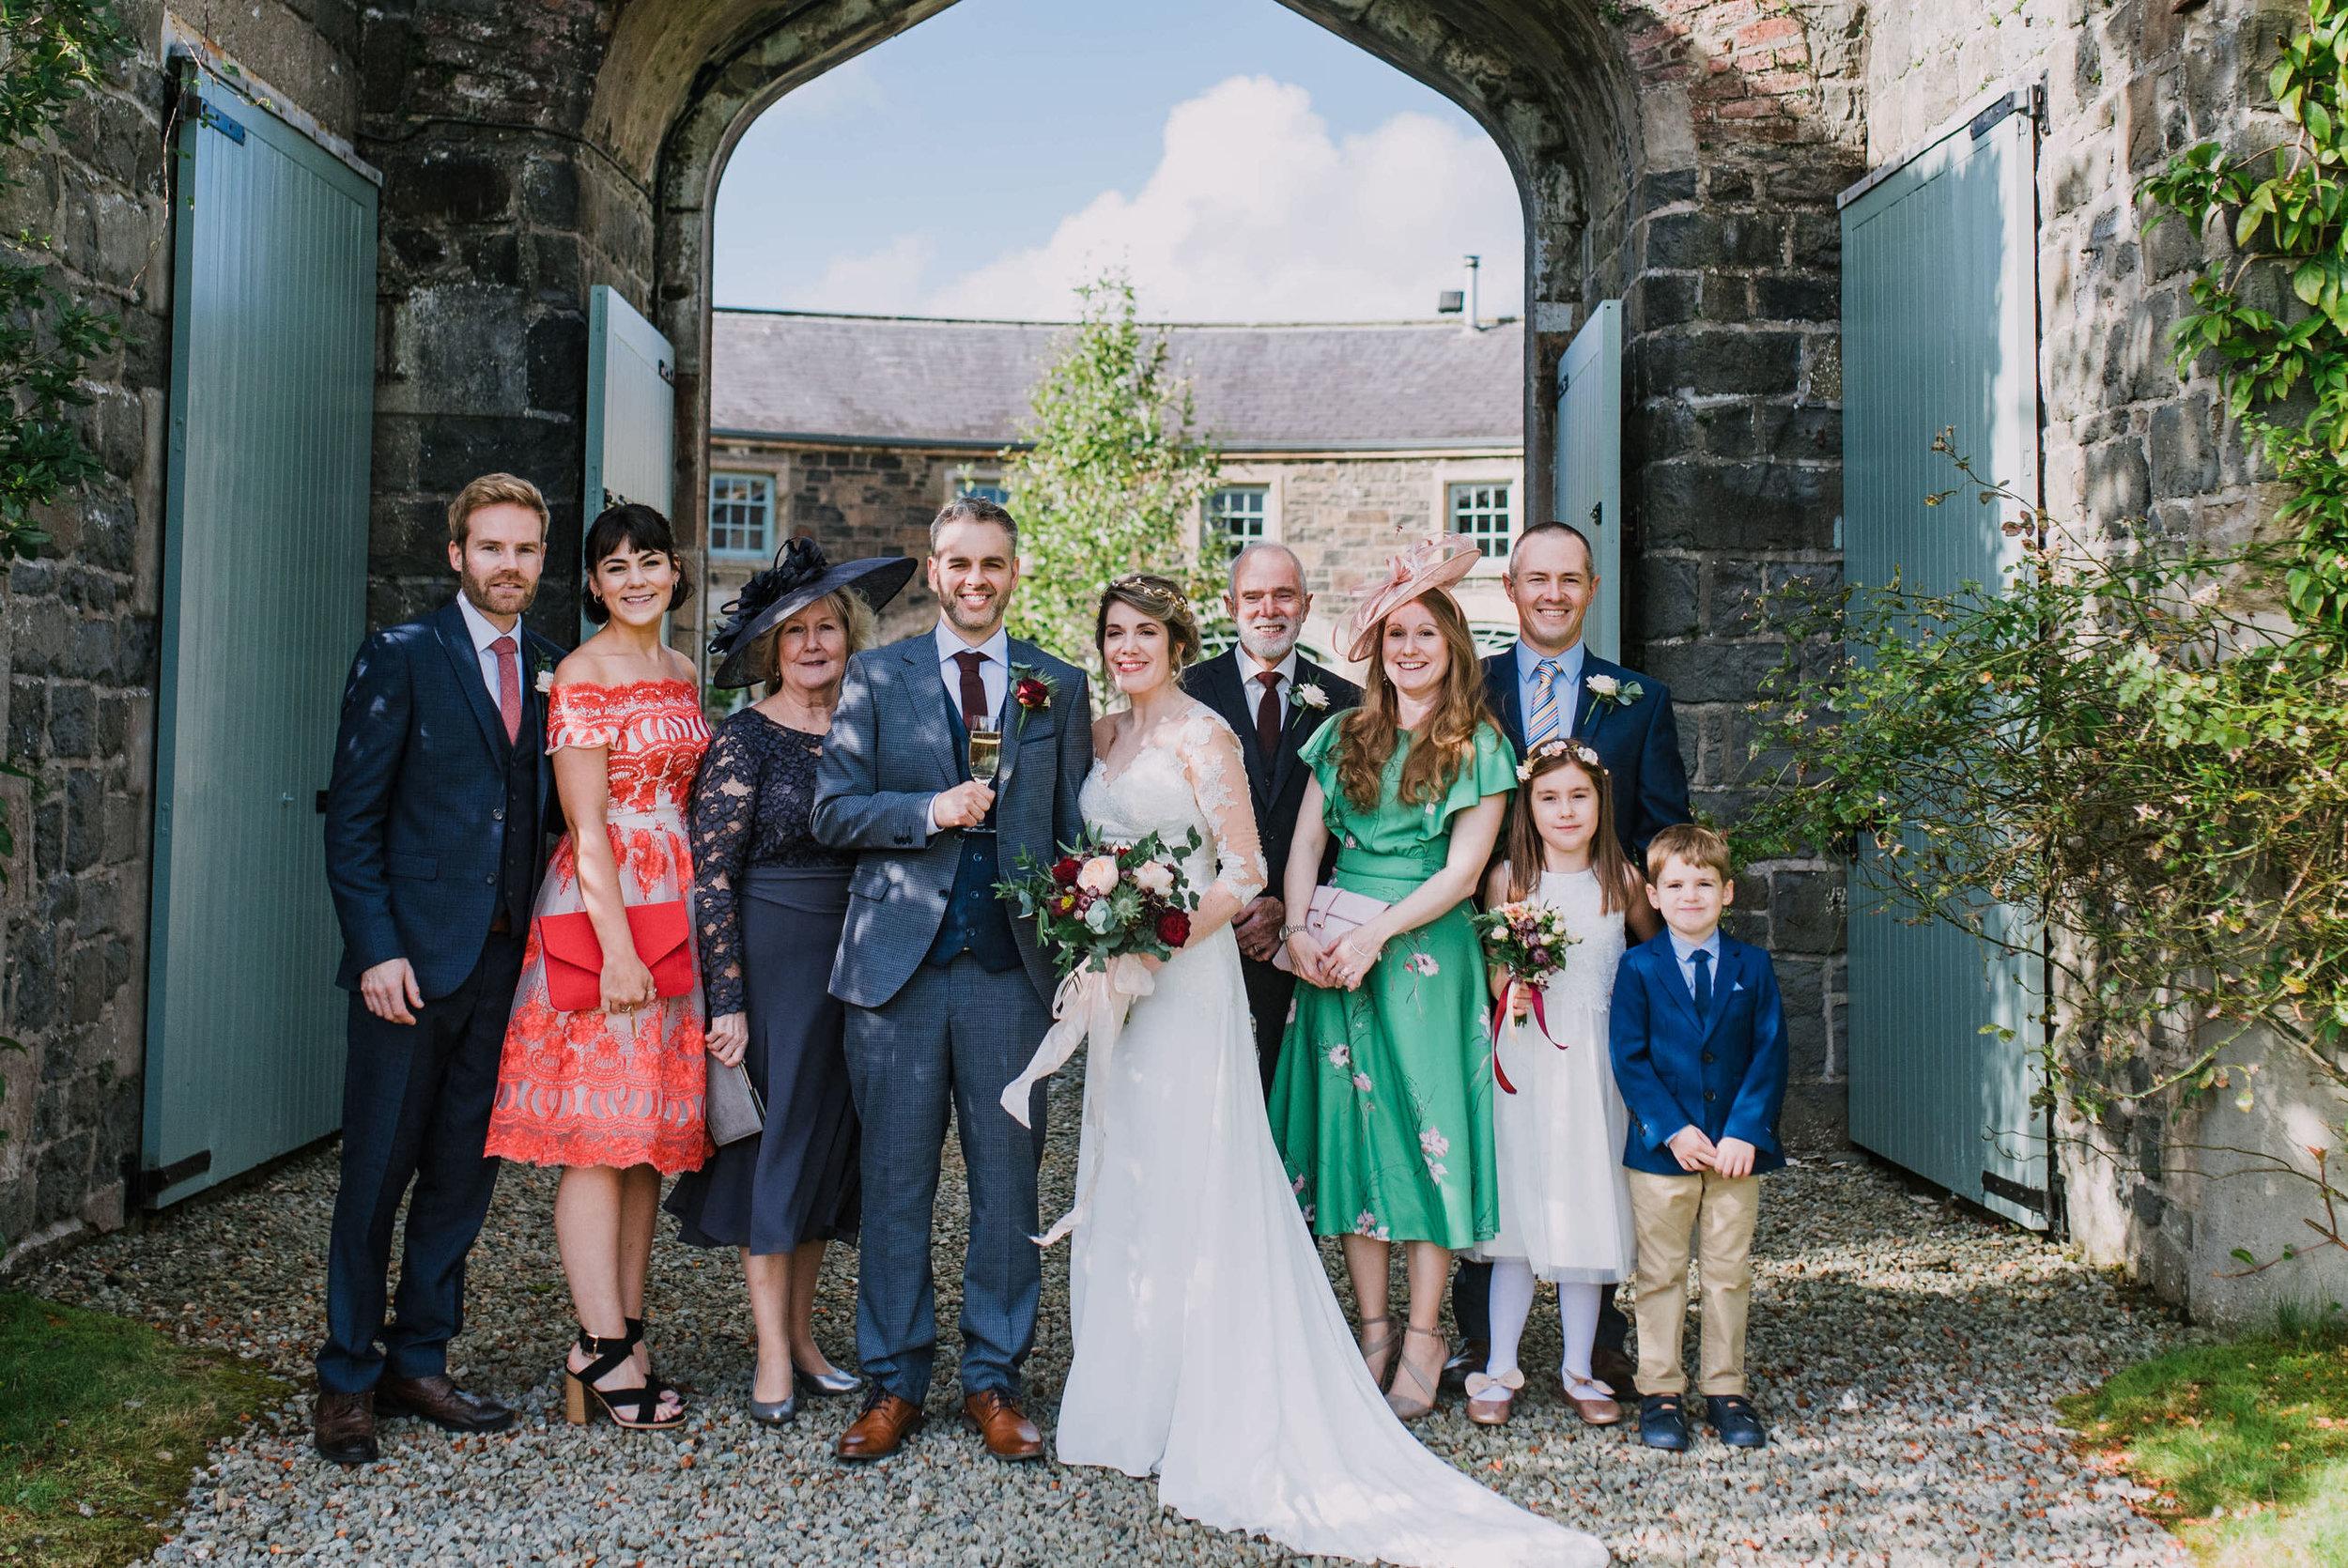 lissanoure castle wedding, northern ireland wedding photographer, romantic northern irish wedding venue, castle wedding ireland, natural wedding photography ni (77).jpg